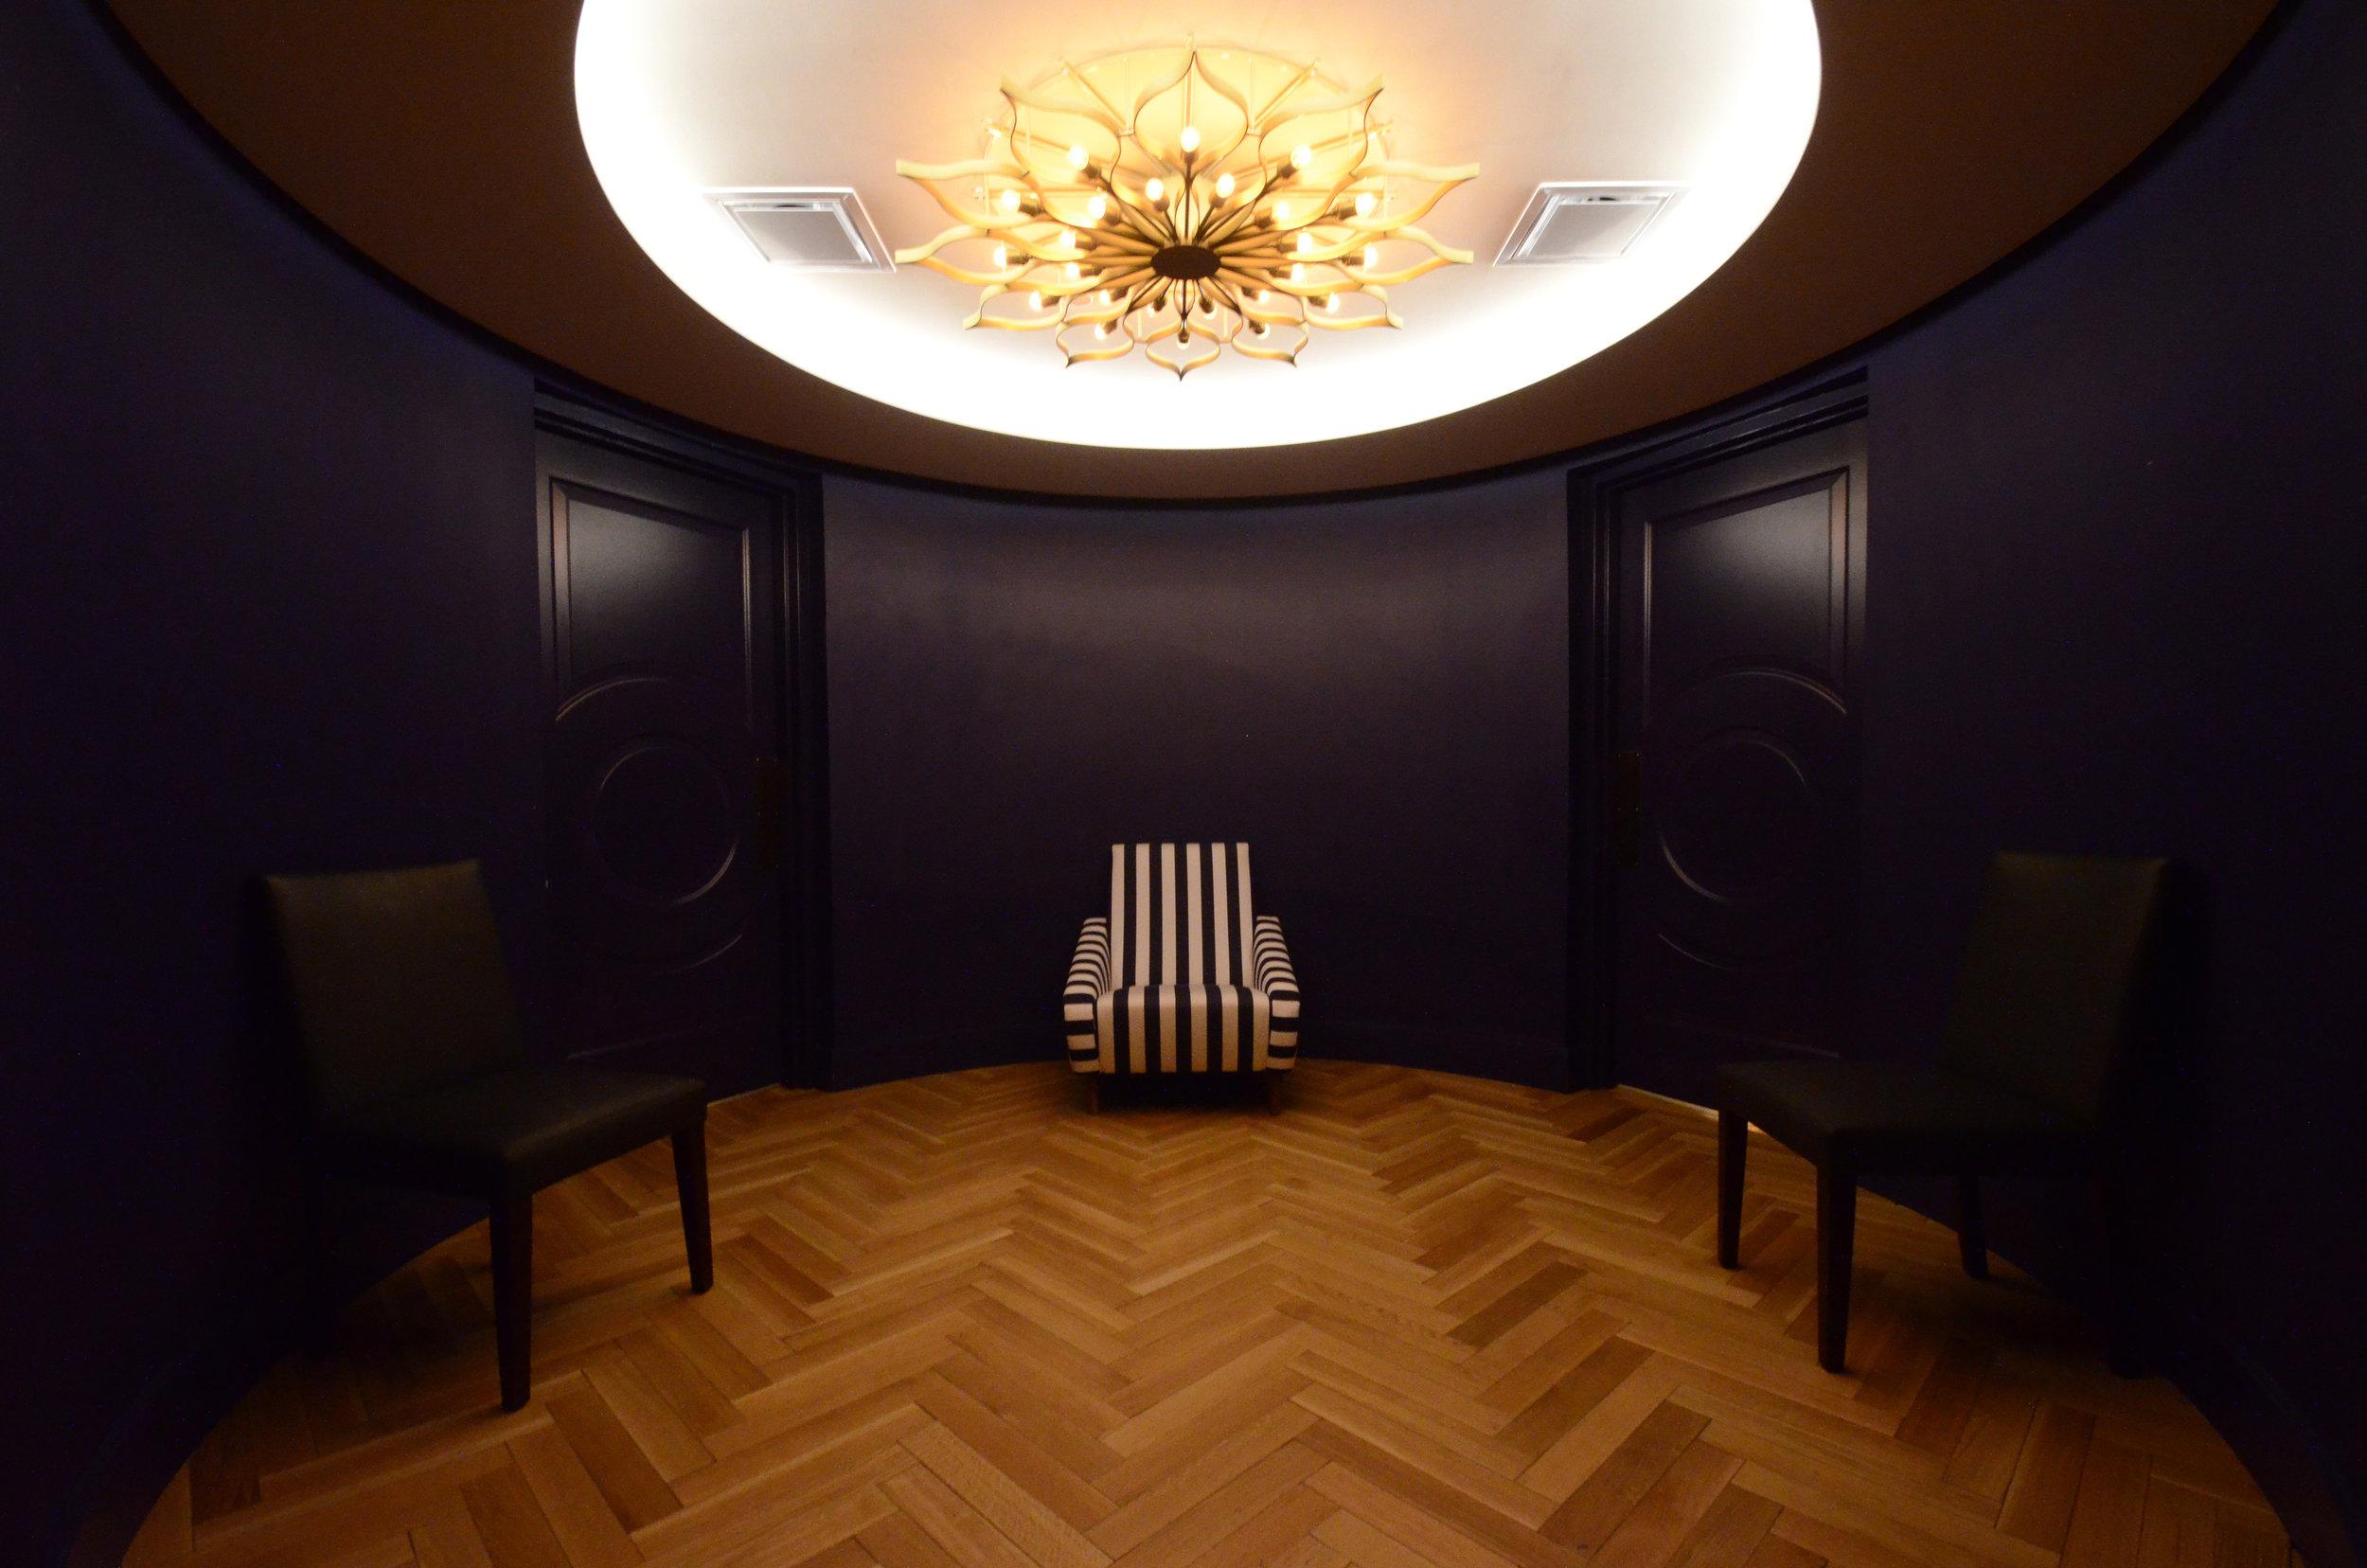 restroom_lobby.JPG